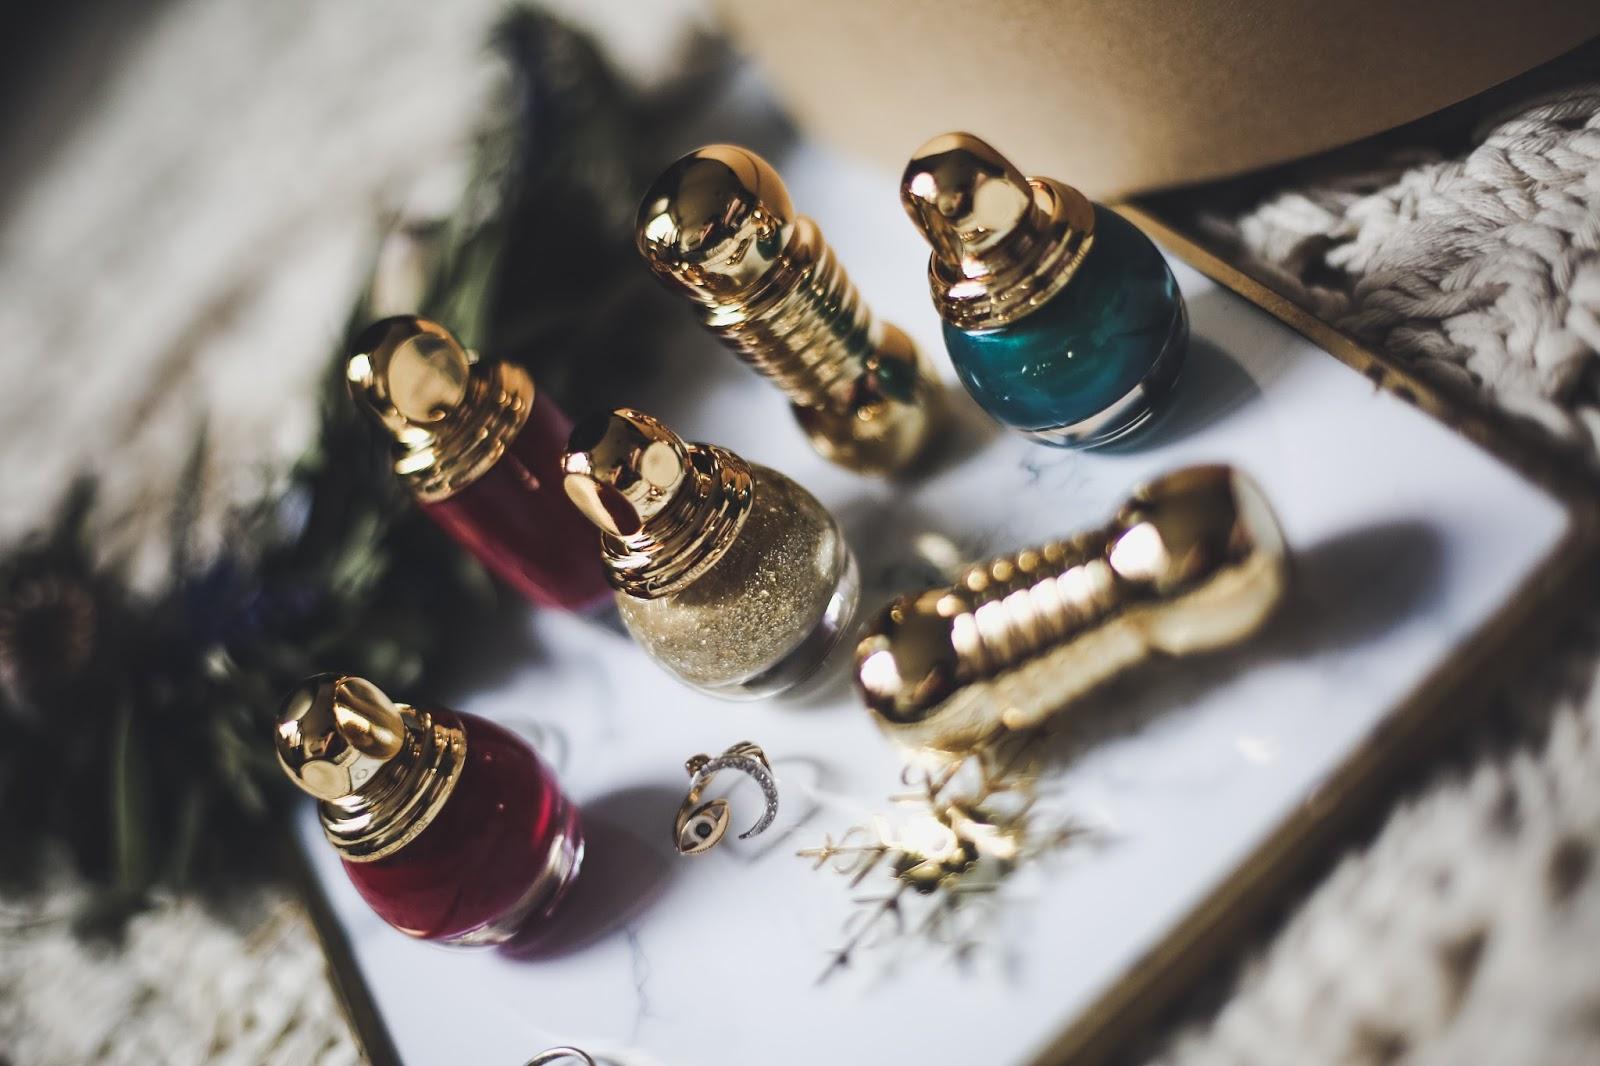 Vernis liner à ongles Diorific édition limitée Noël 2017 precious rocks